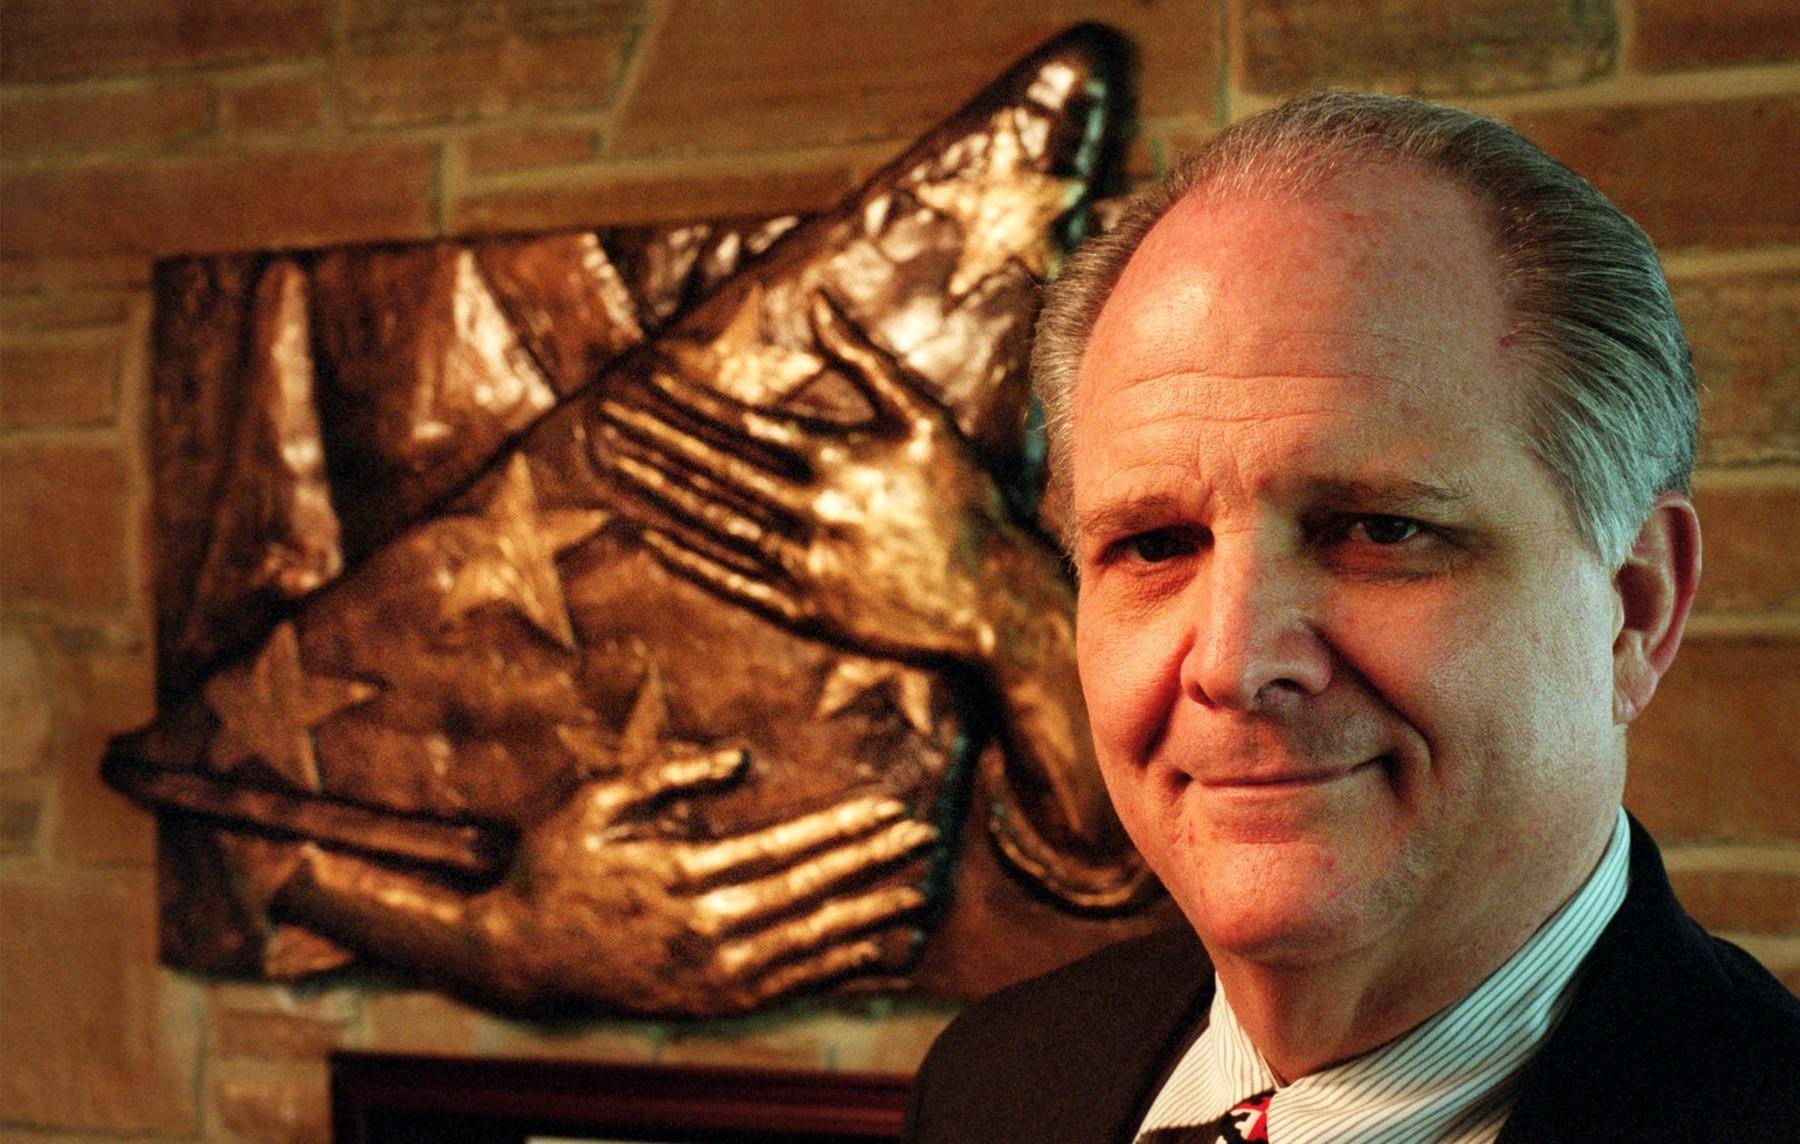 John W. Armiger Jr. obituary - Baltimore Sun